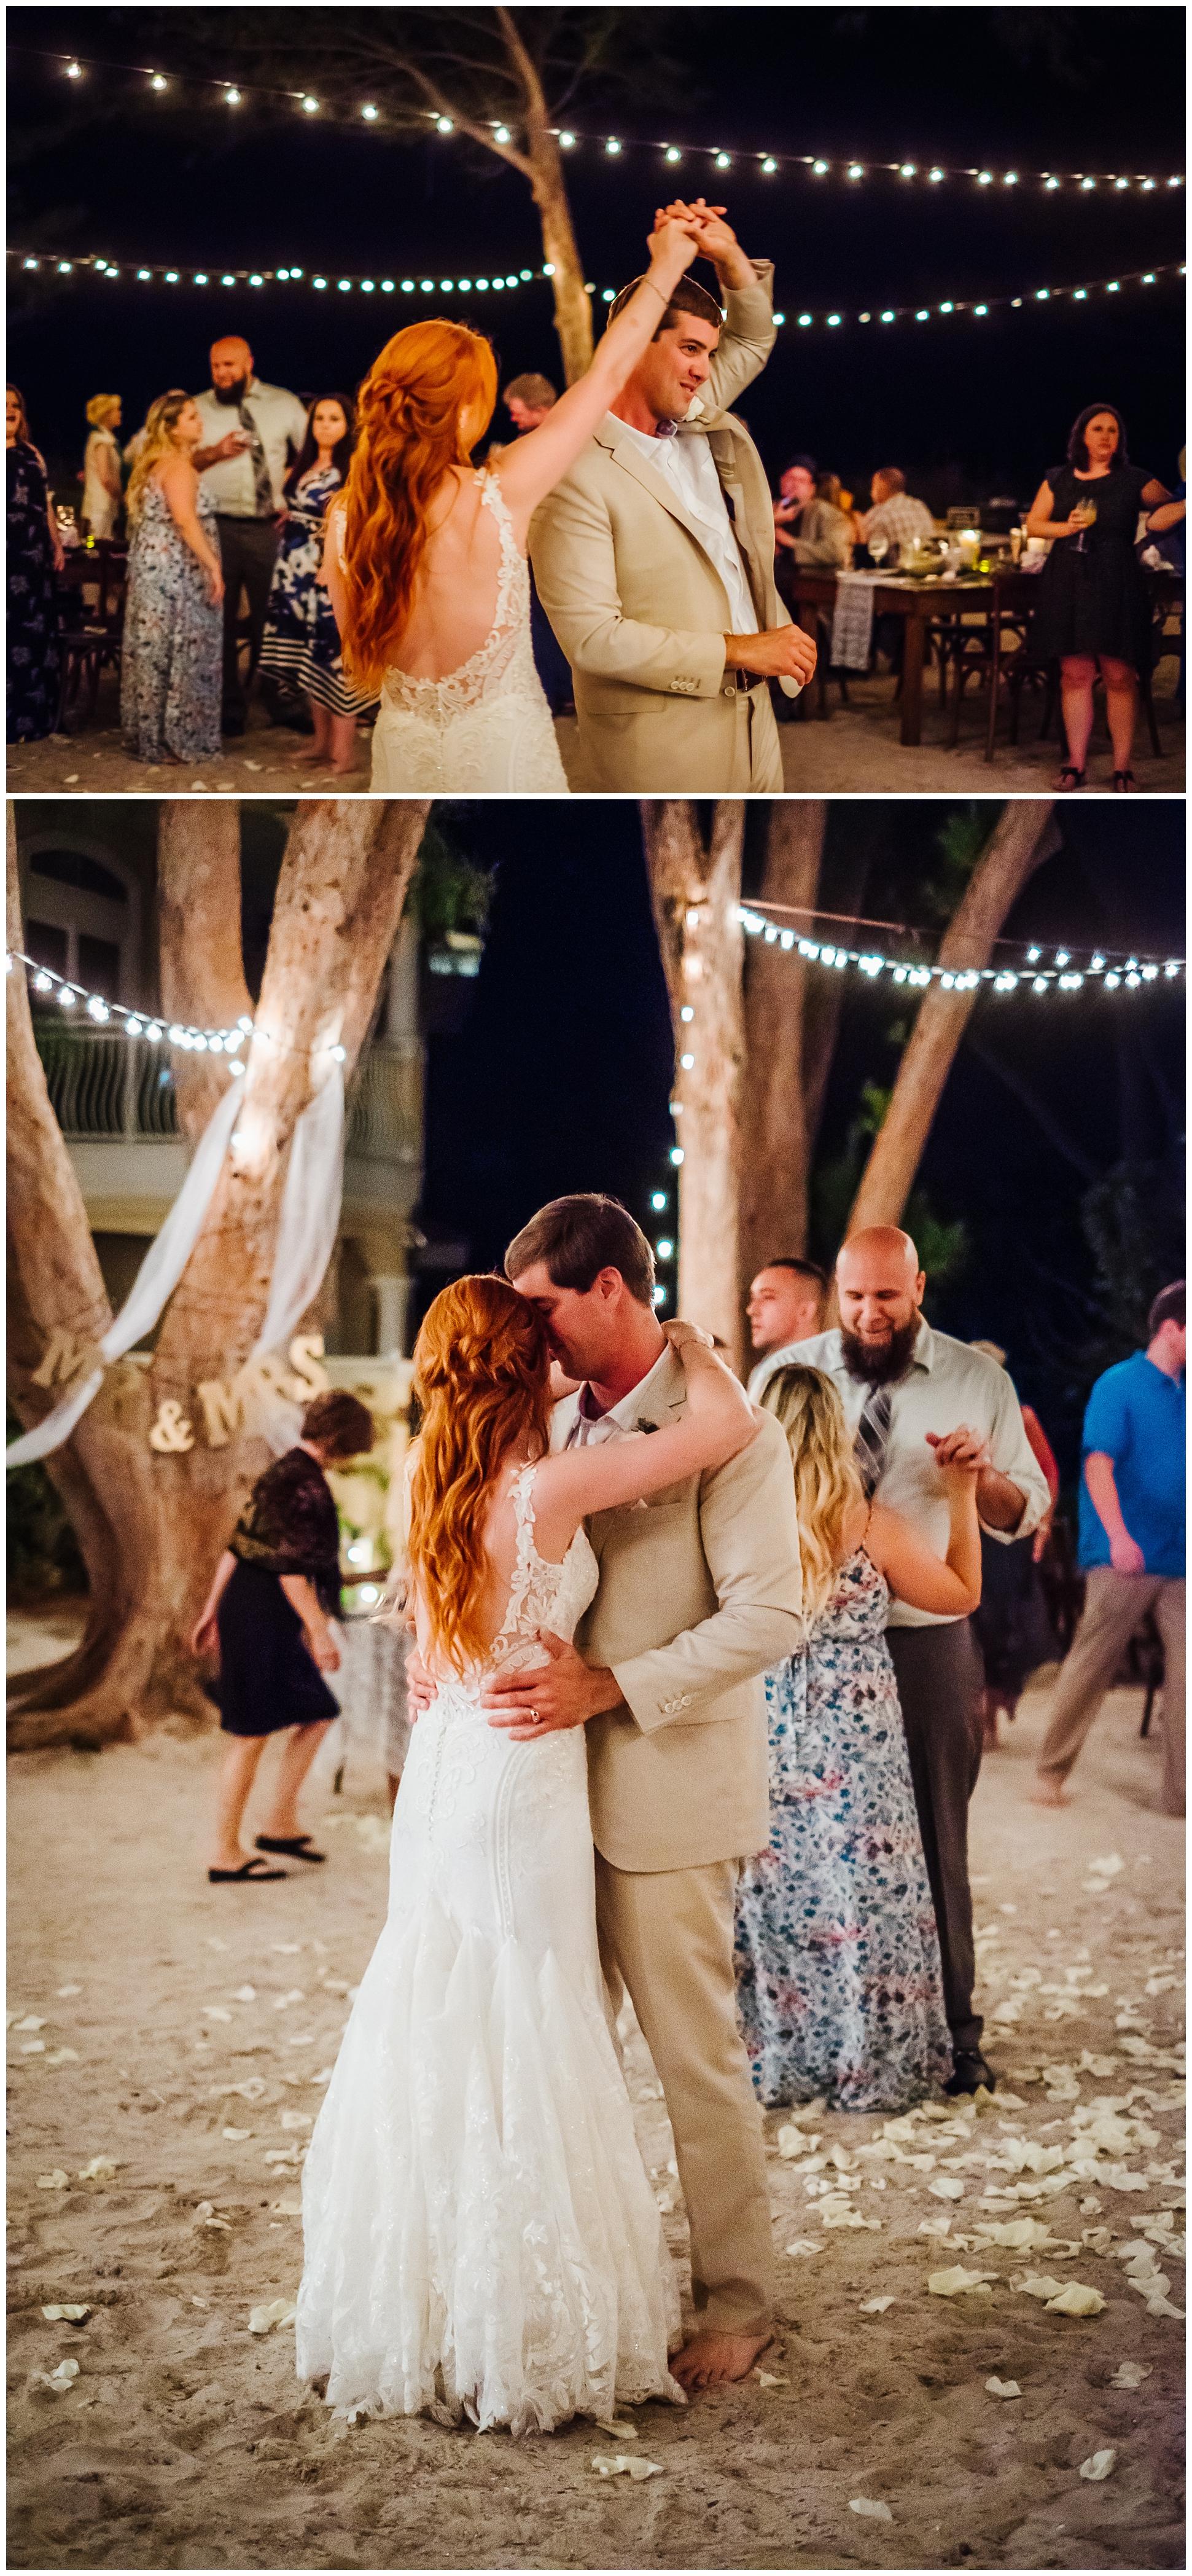 tampa-st-pete-wedding-photographer-indian-rocks-beach-mermaid-train-redhead_0182.jpg